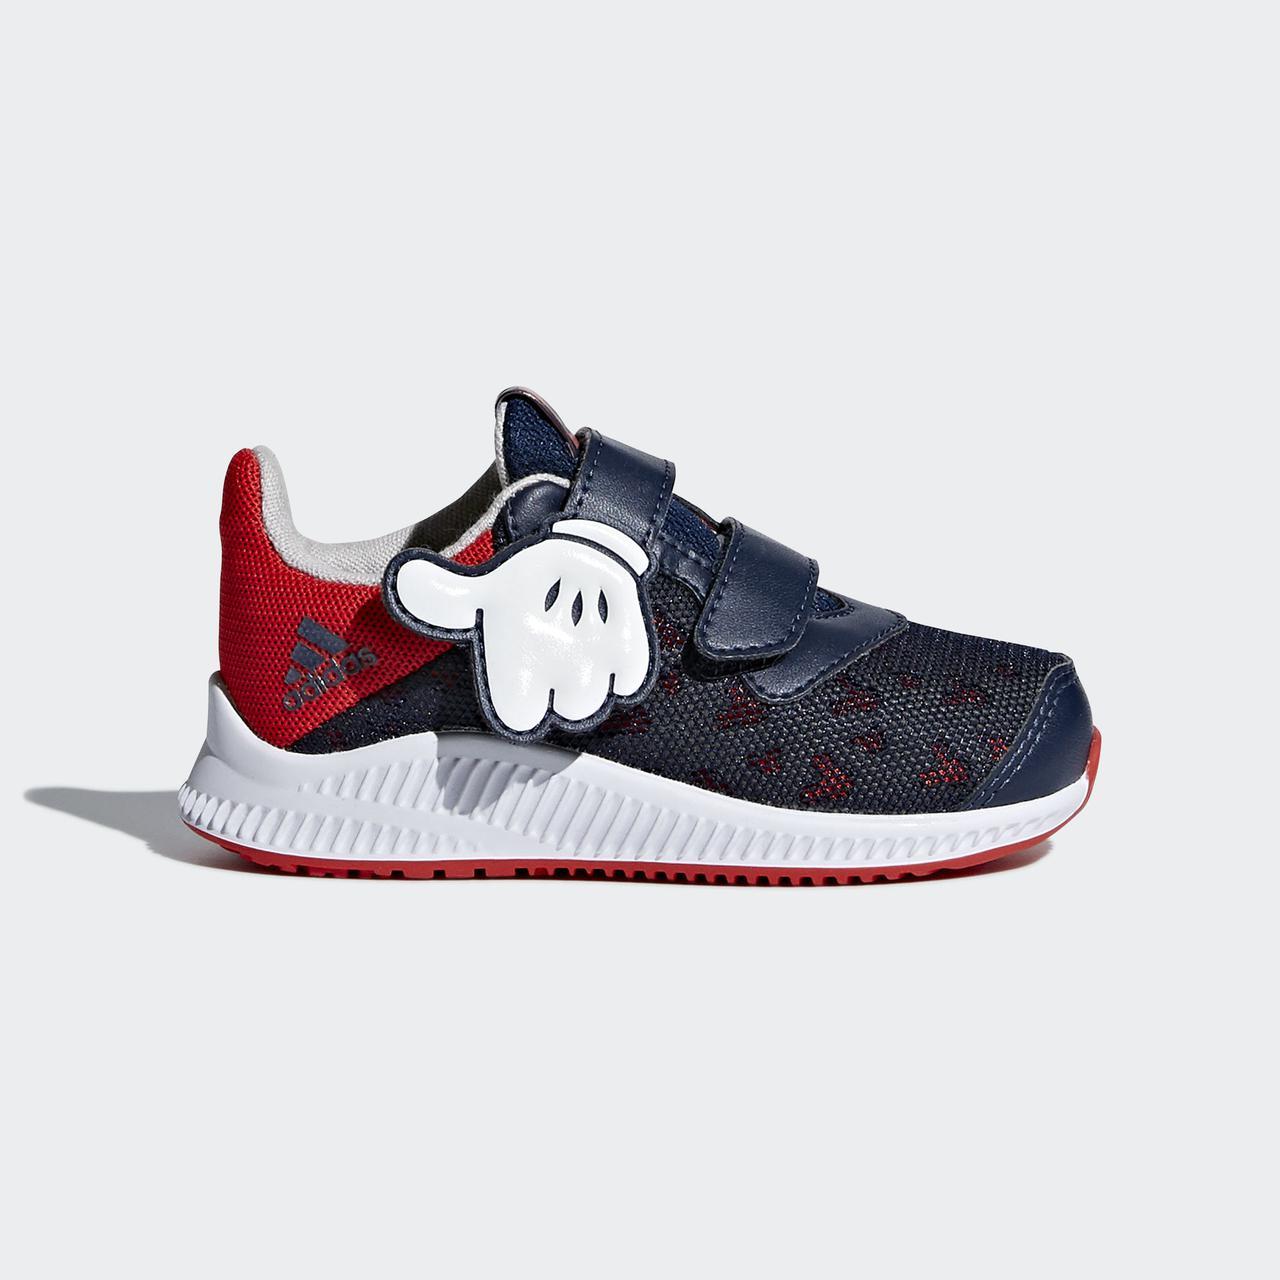 588dab0f Детские кроссовки Adidas Performance Disney Mickey Fortarun (Артикул:  B42154) - Интернет-магазин